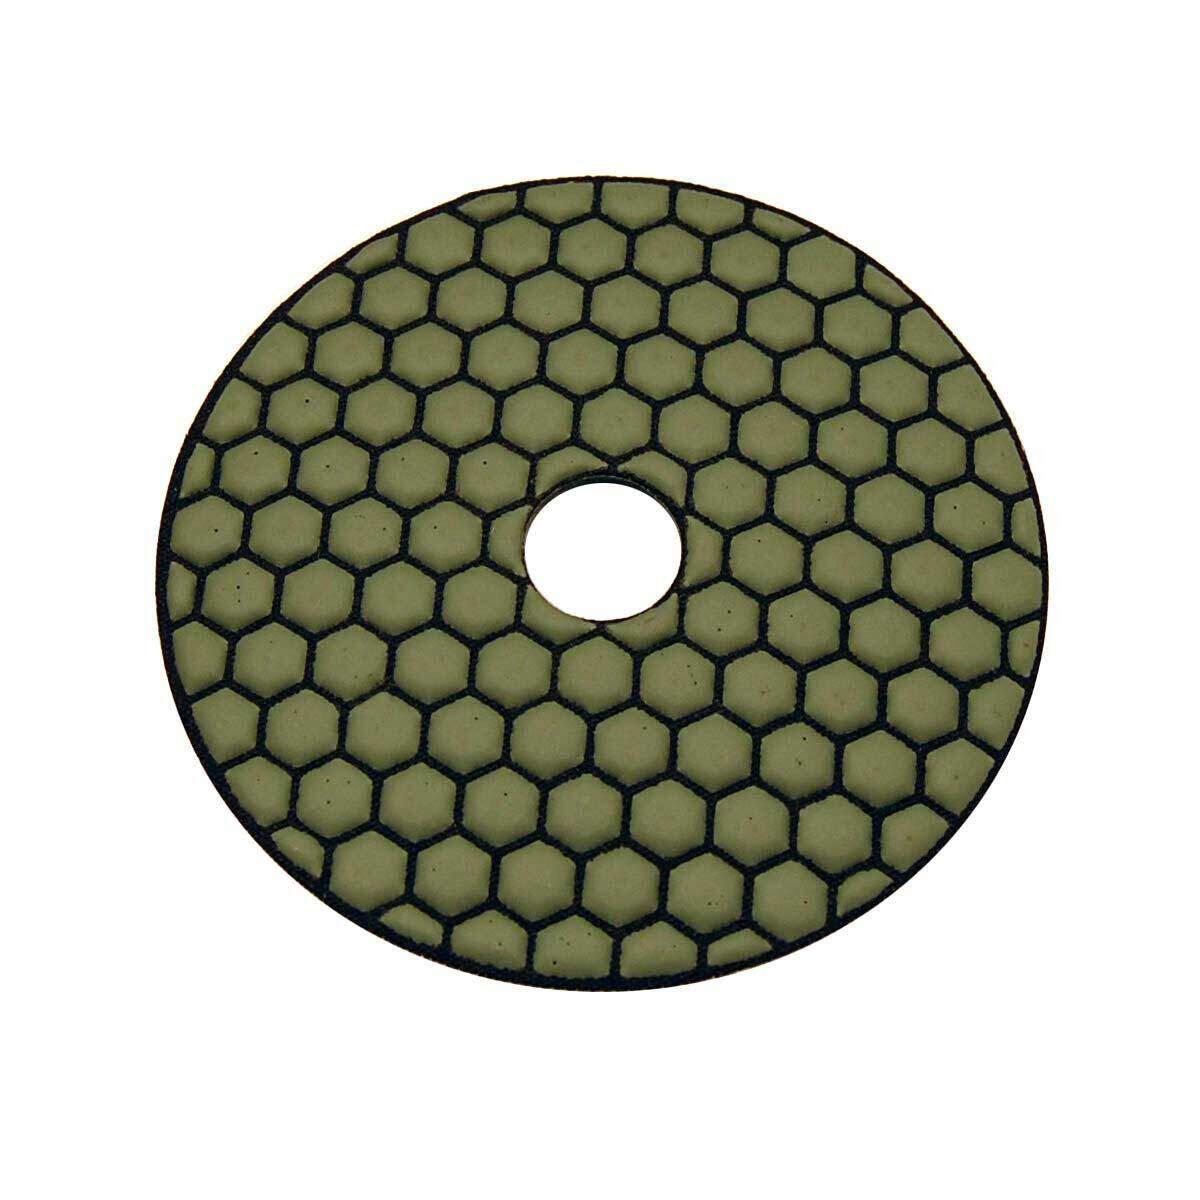 Dry Diamond Polishing Pad for Stone